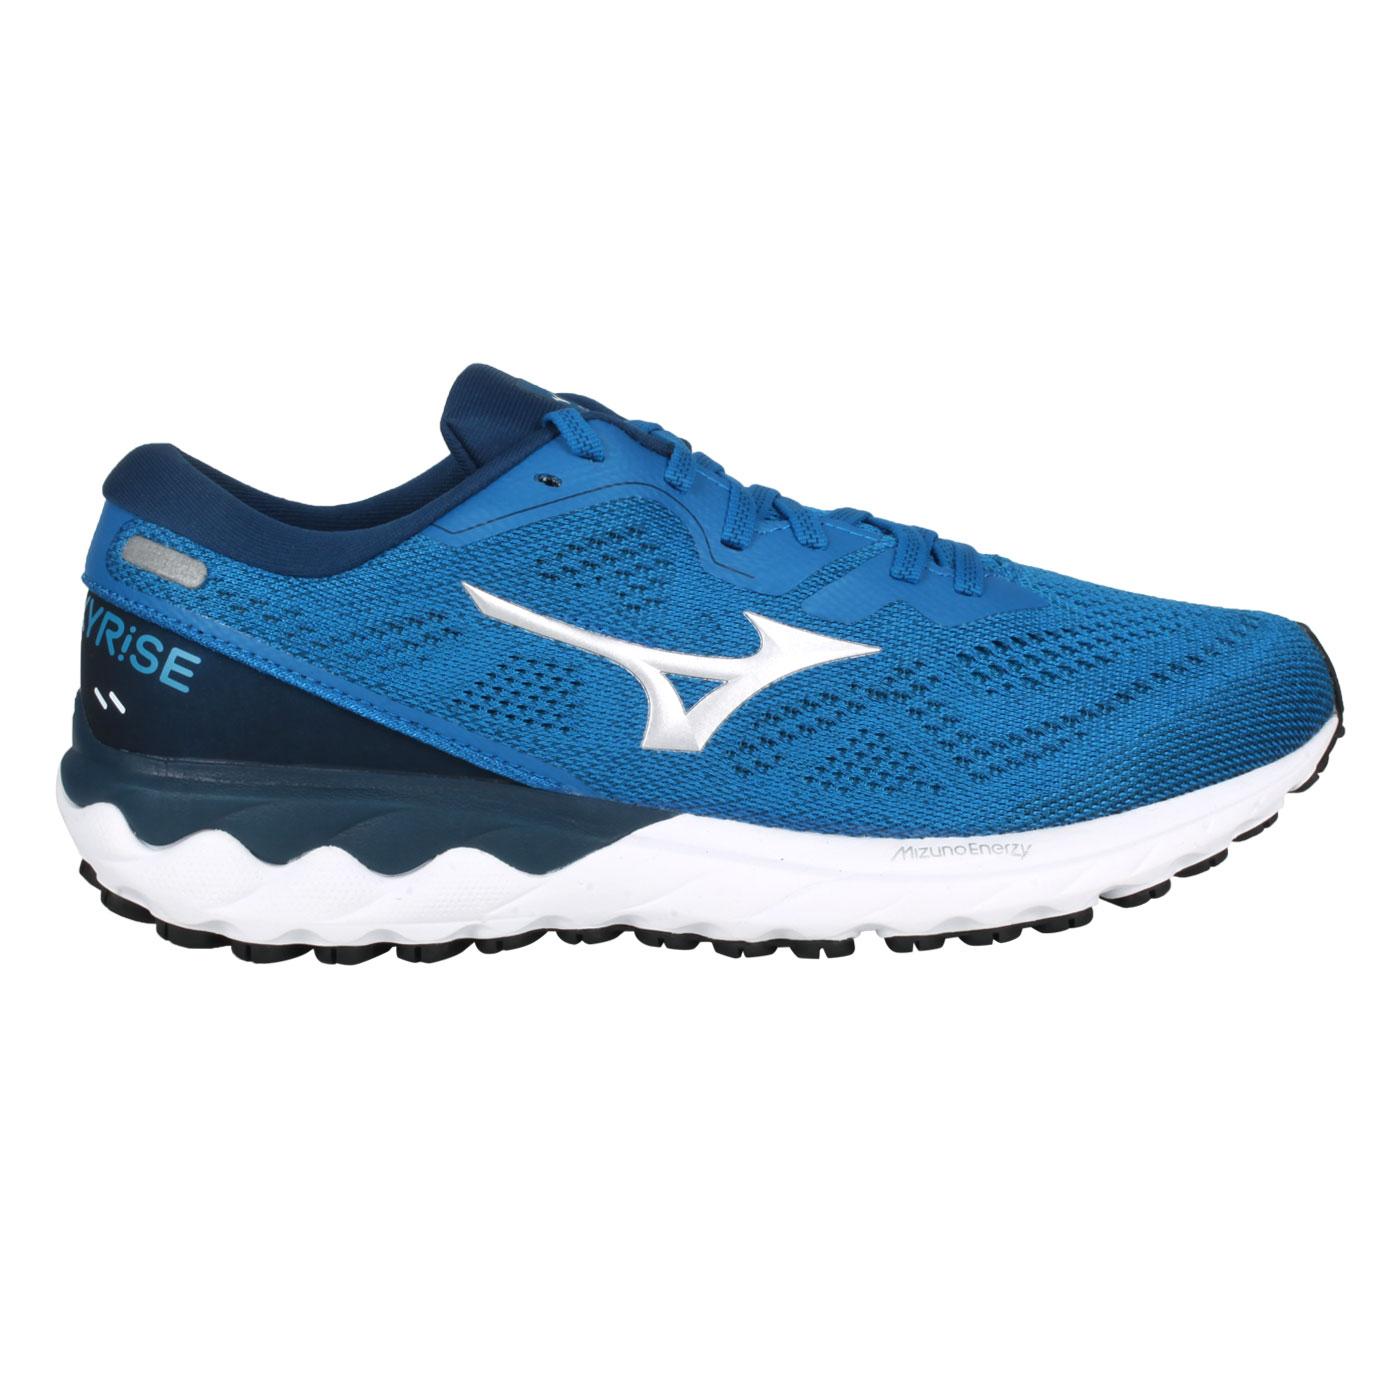 MIZUNO 男款慢跑鞋  @WAVE SKYRISE 2@J1GC210904 - 丈青藍銀